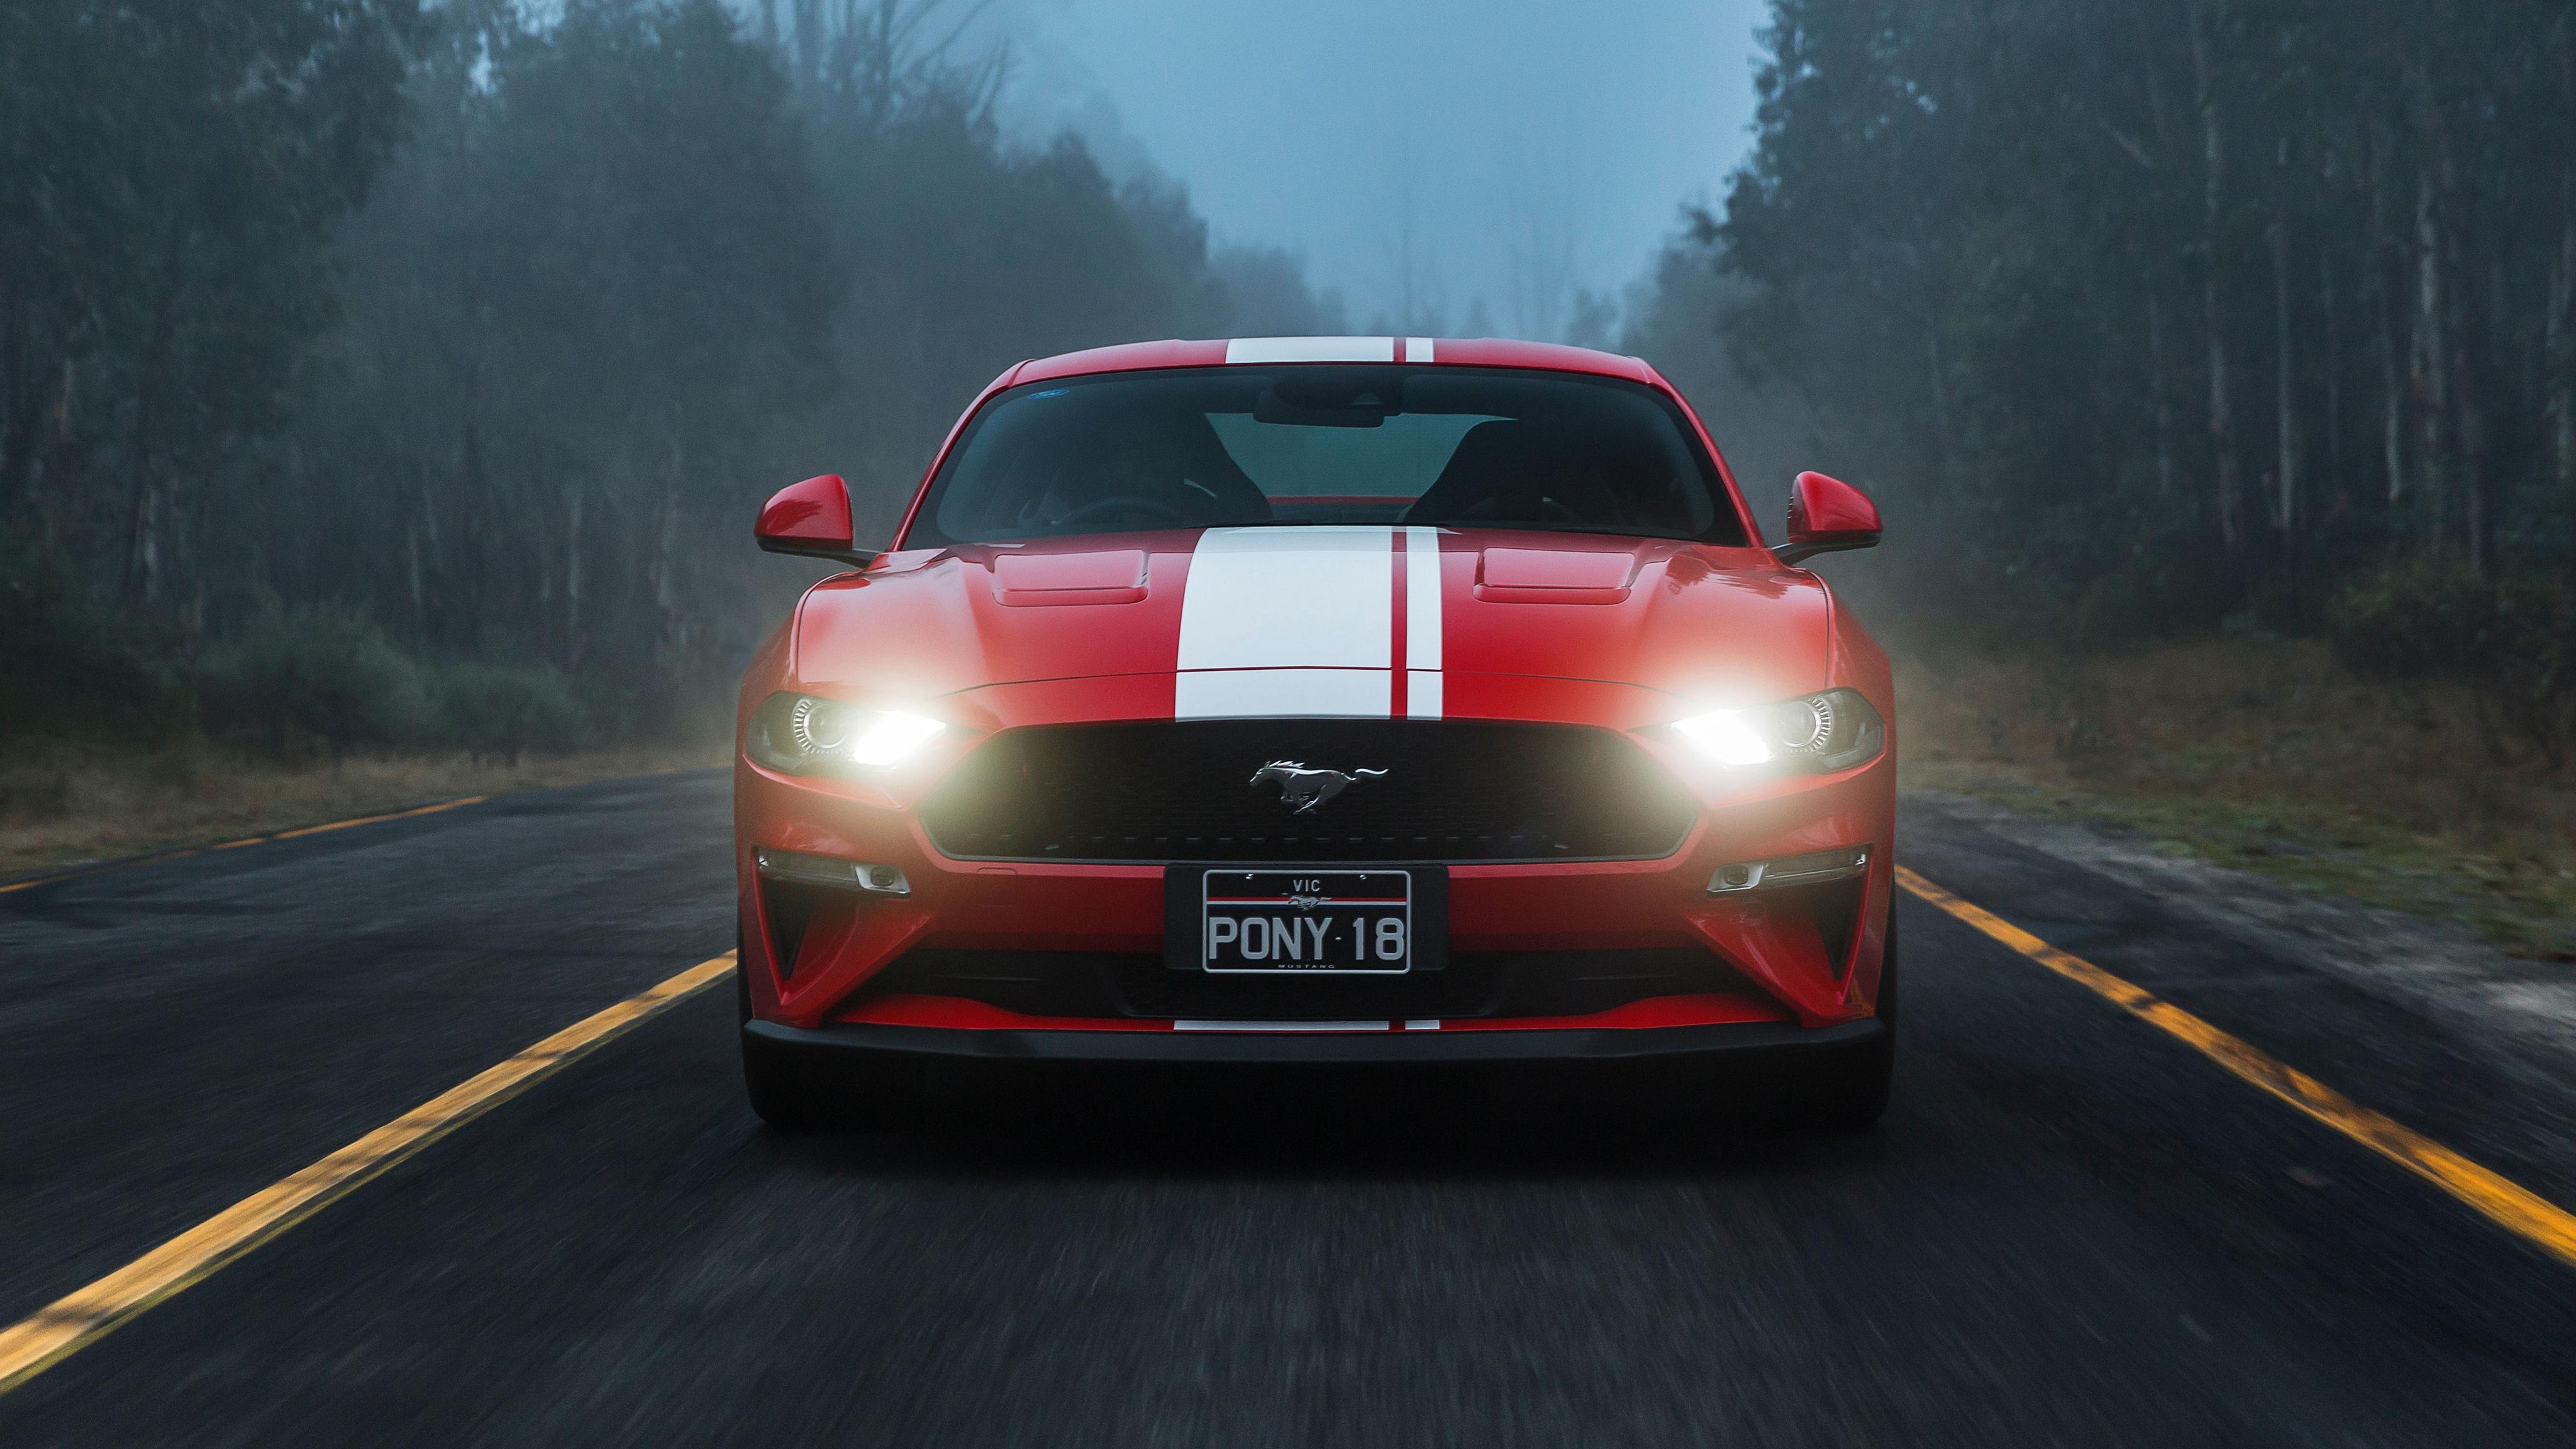 Ford Mustang Gt 4k Ultra Fondo De Pantalla Hd Fondo De Escritorio 4096x2304 Id 936914 Wallpaper Abyss